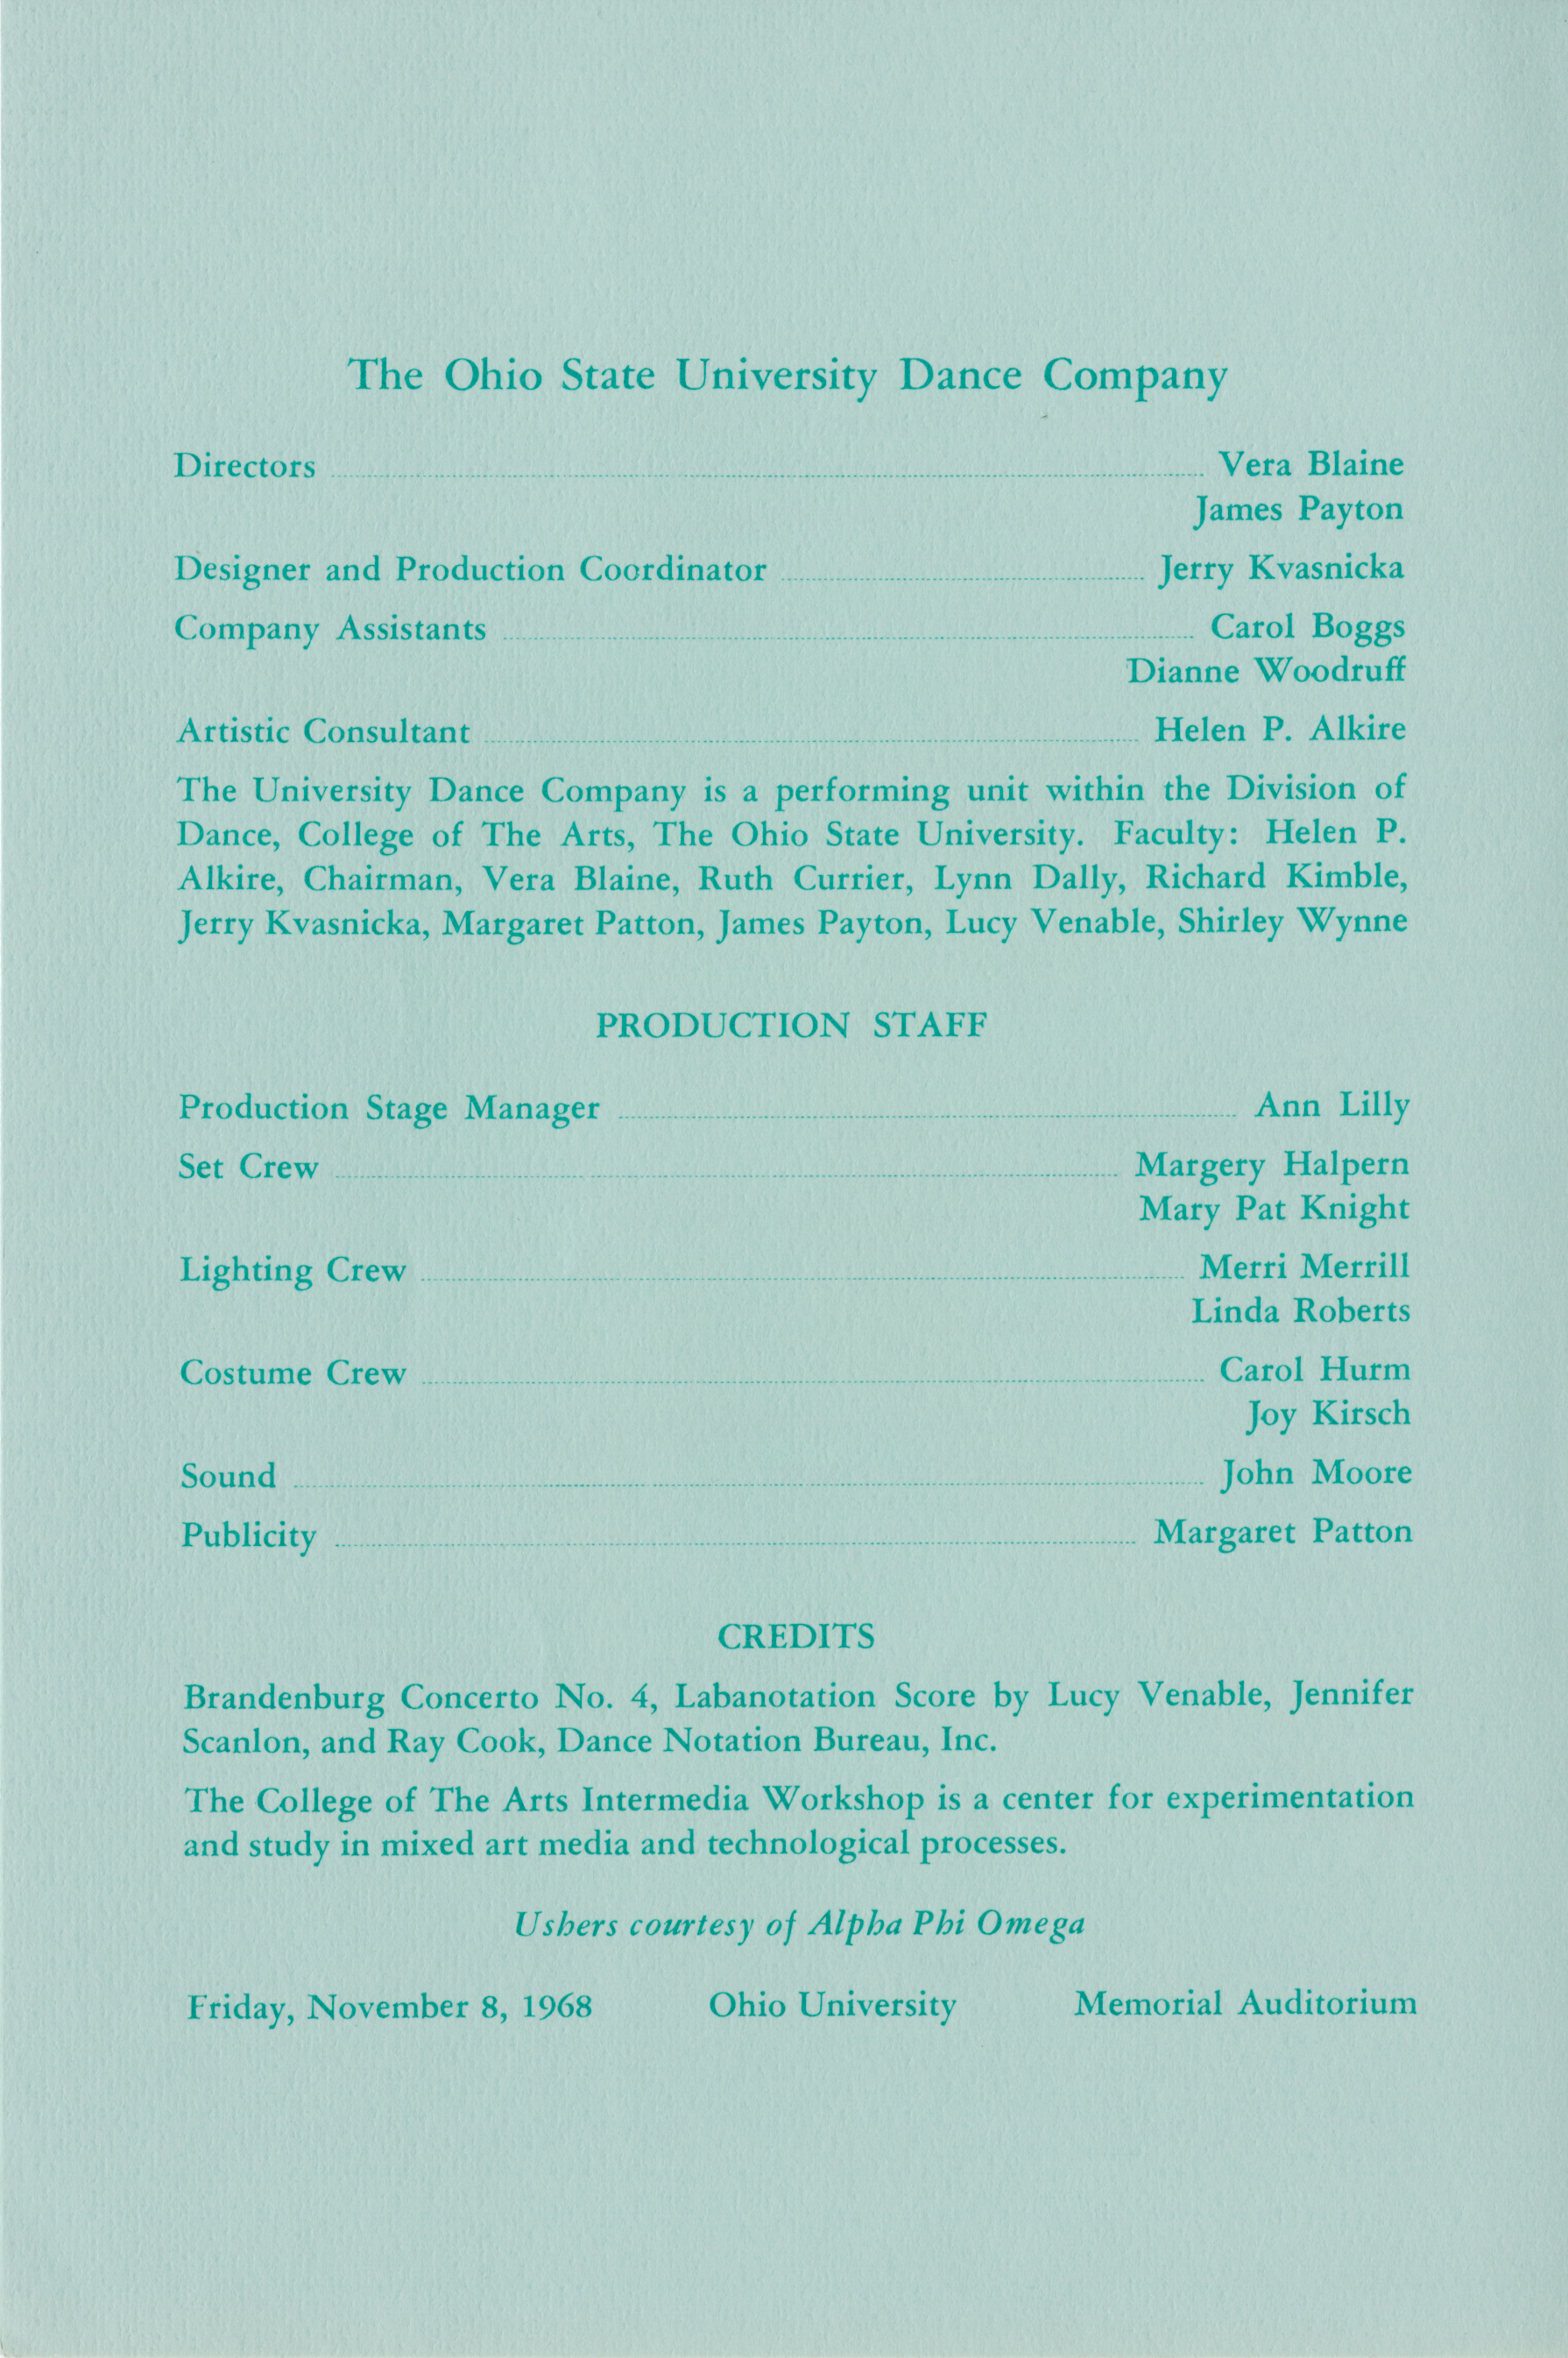 UDC_1968.2_DancePrograms-015-003.jpg